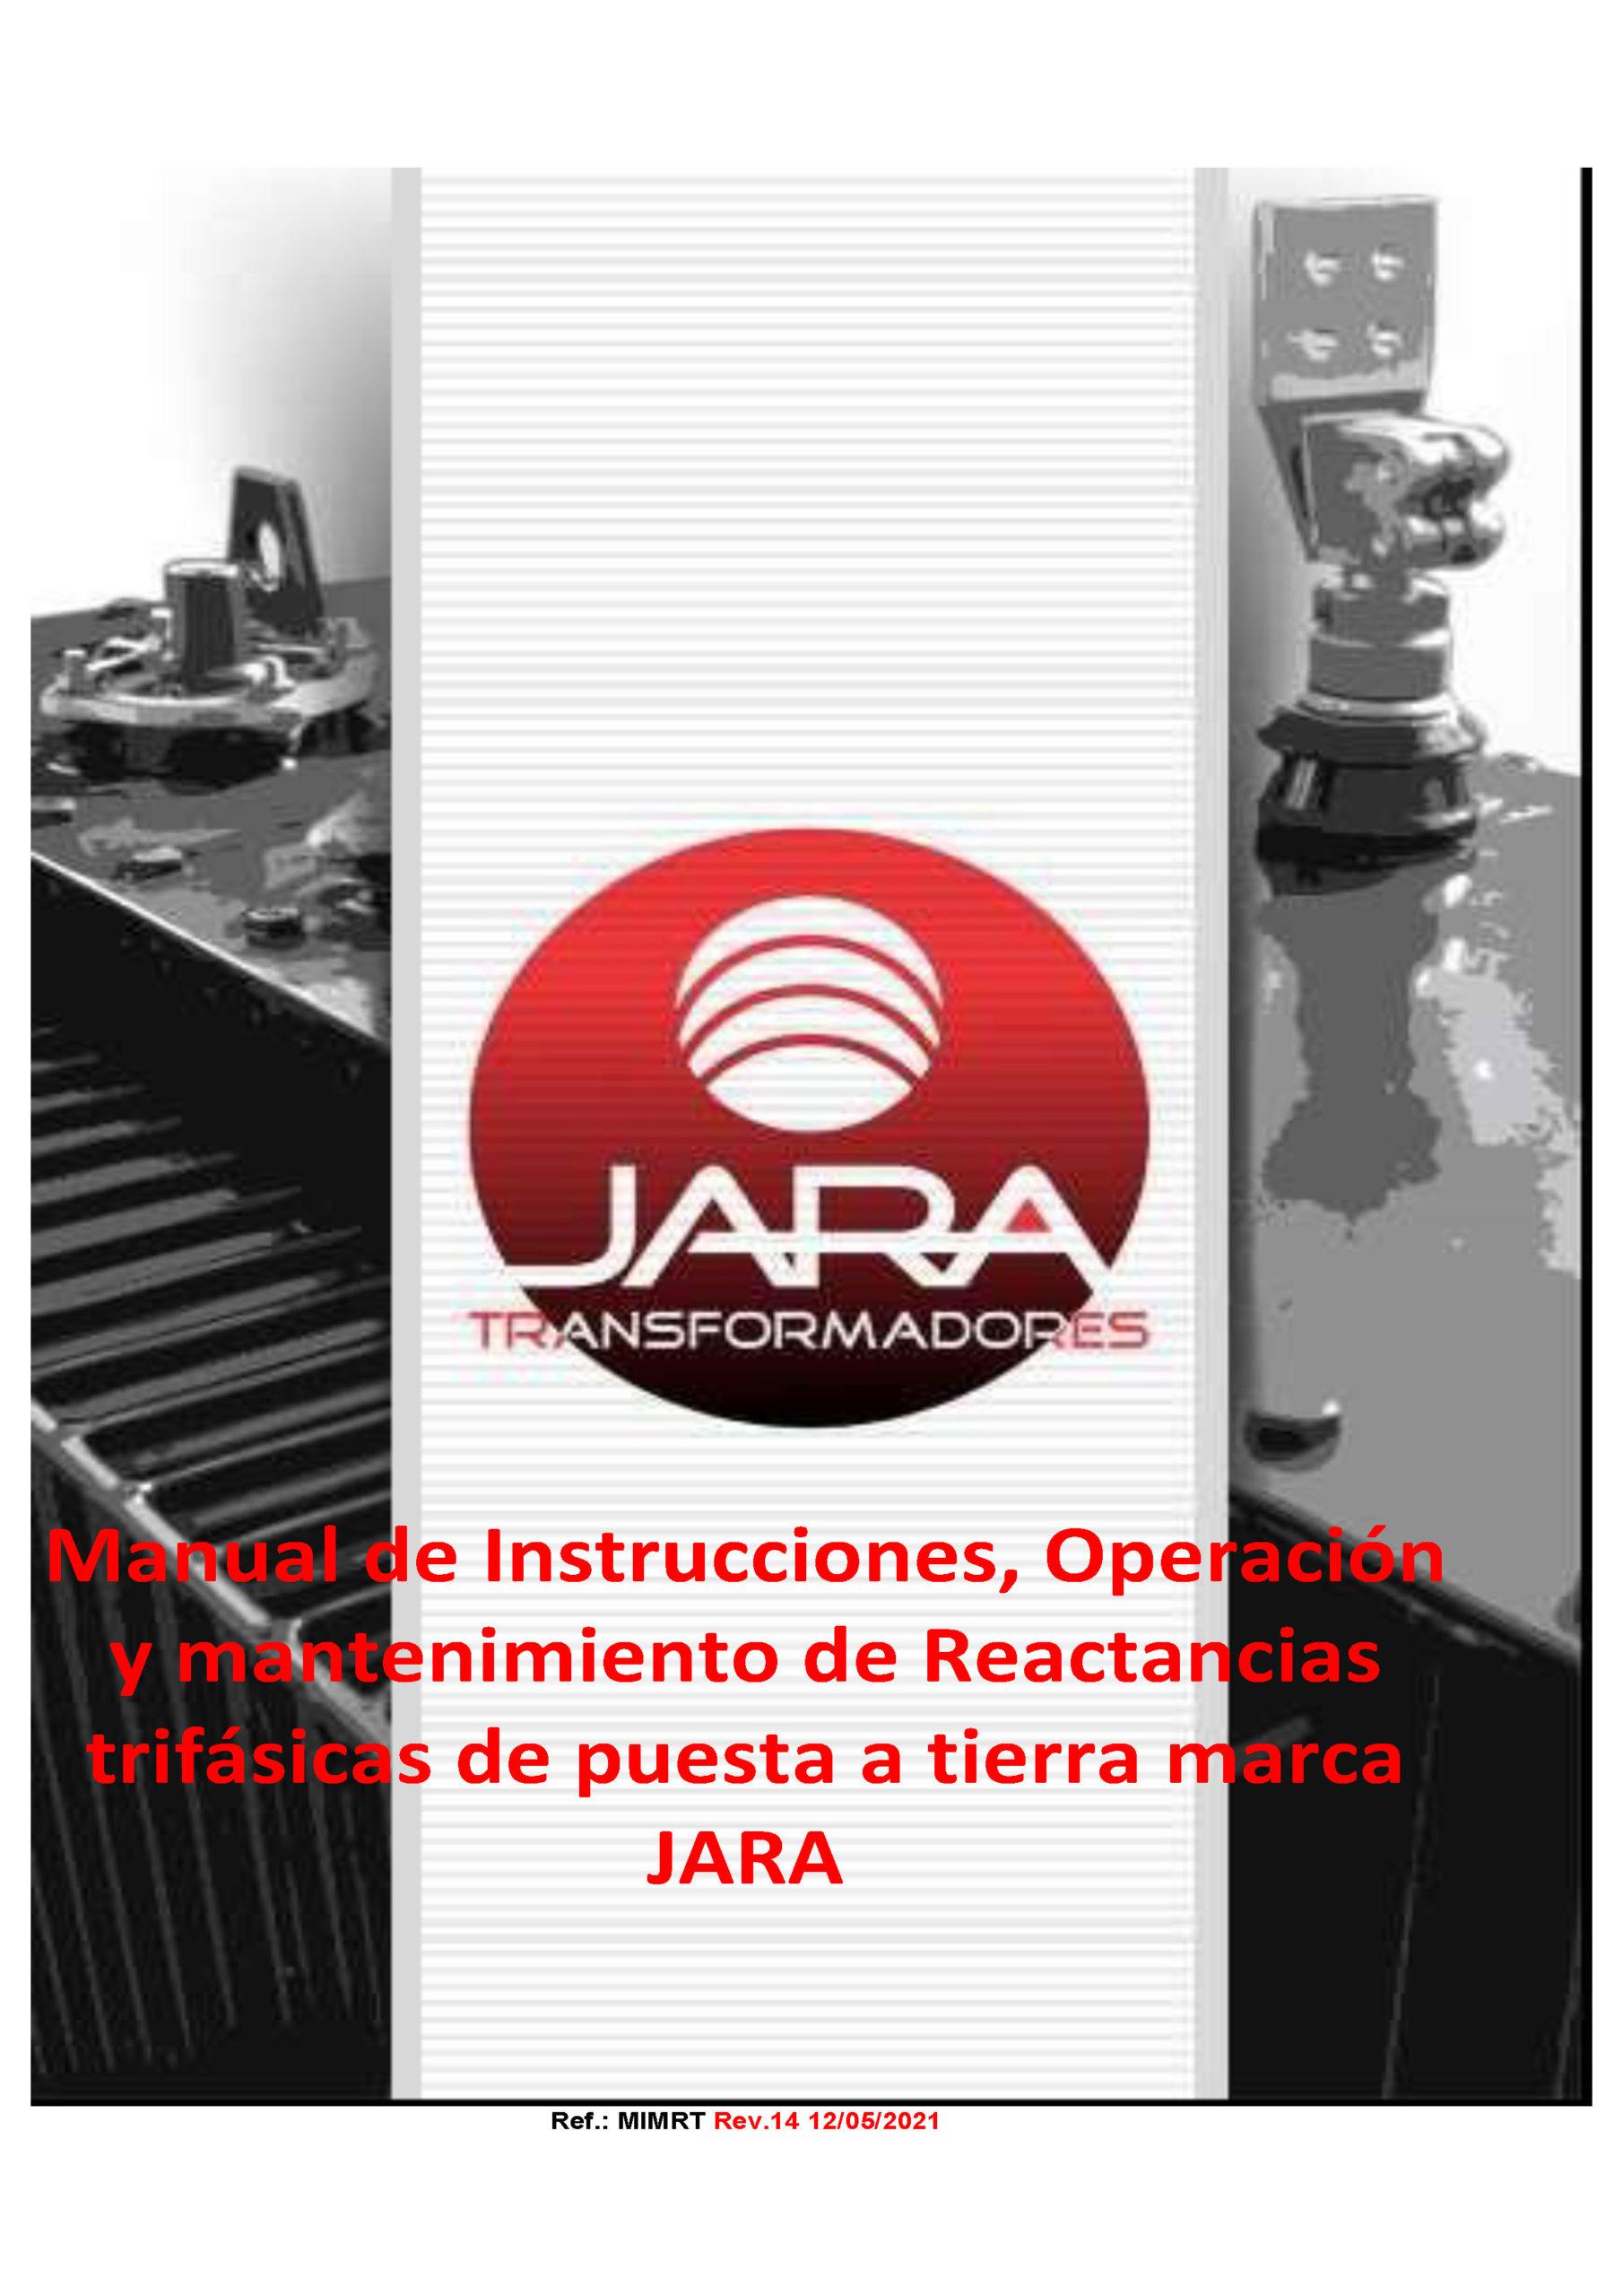 reactancias_jara_1